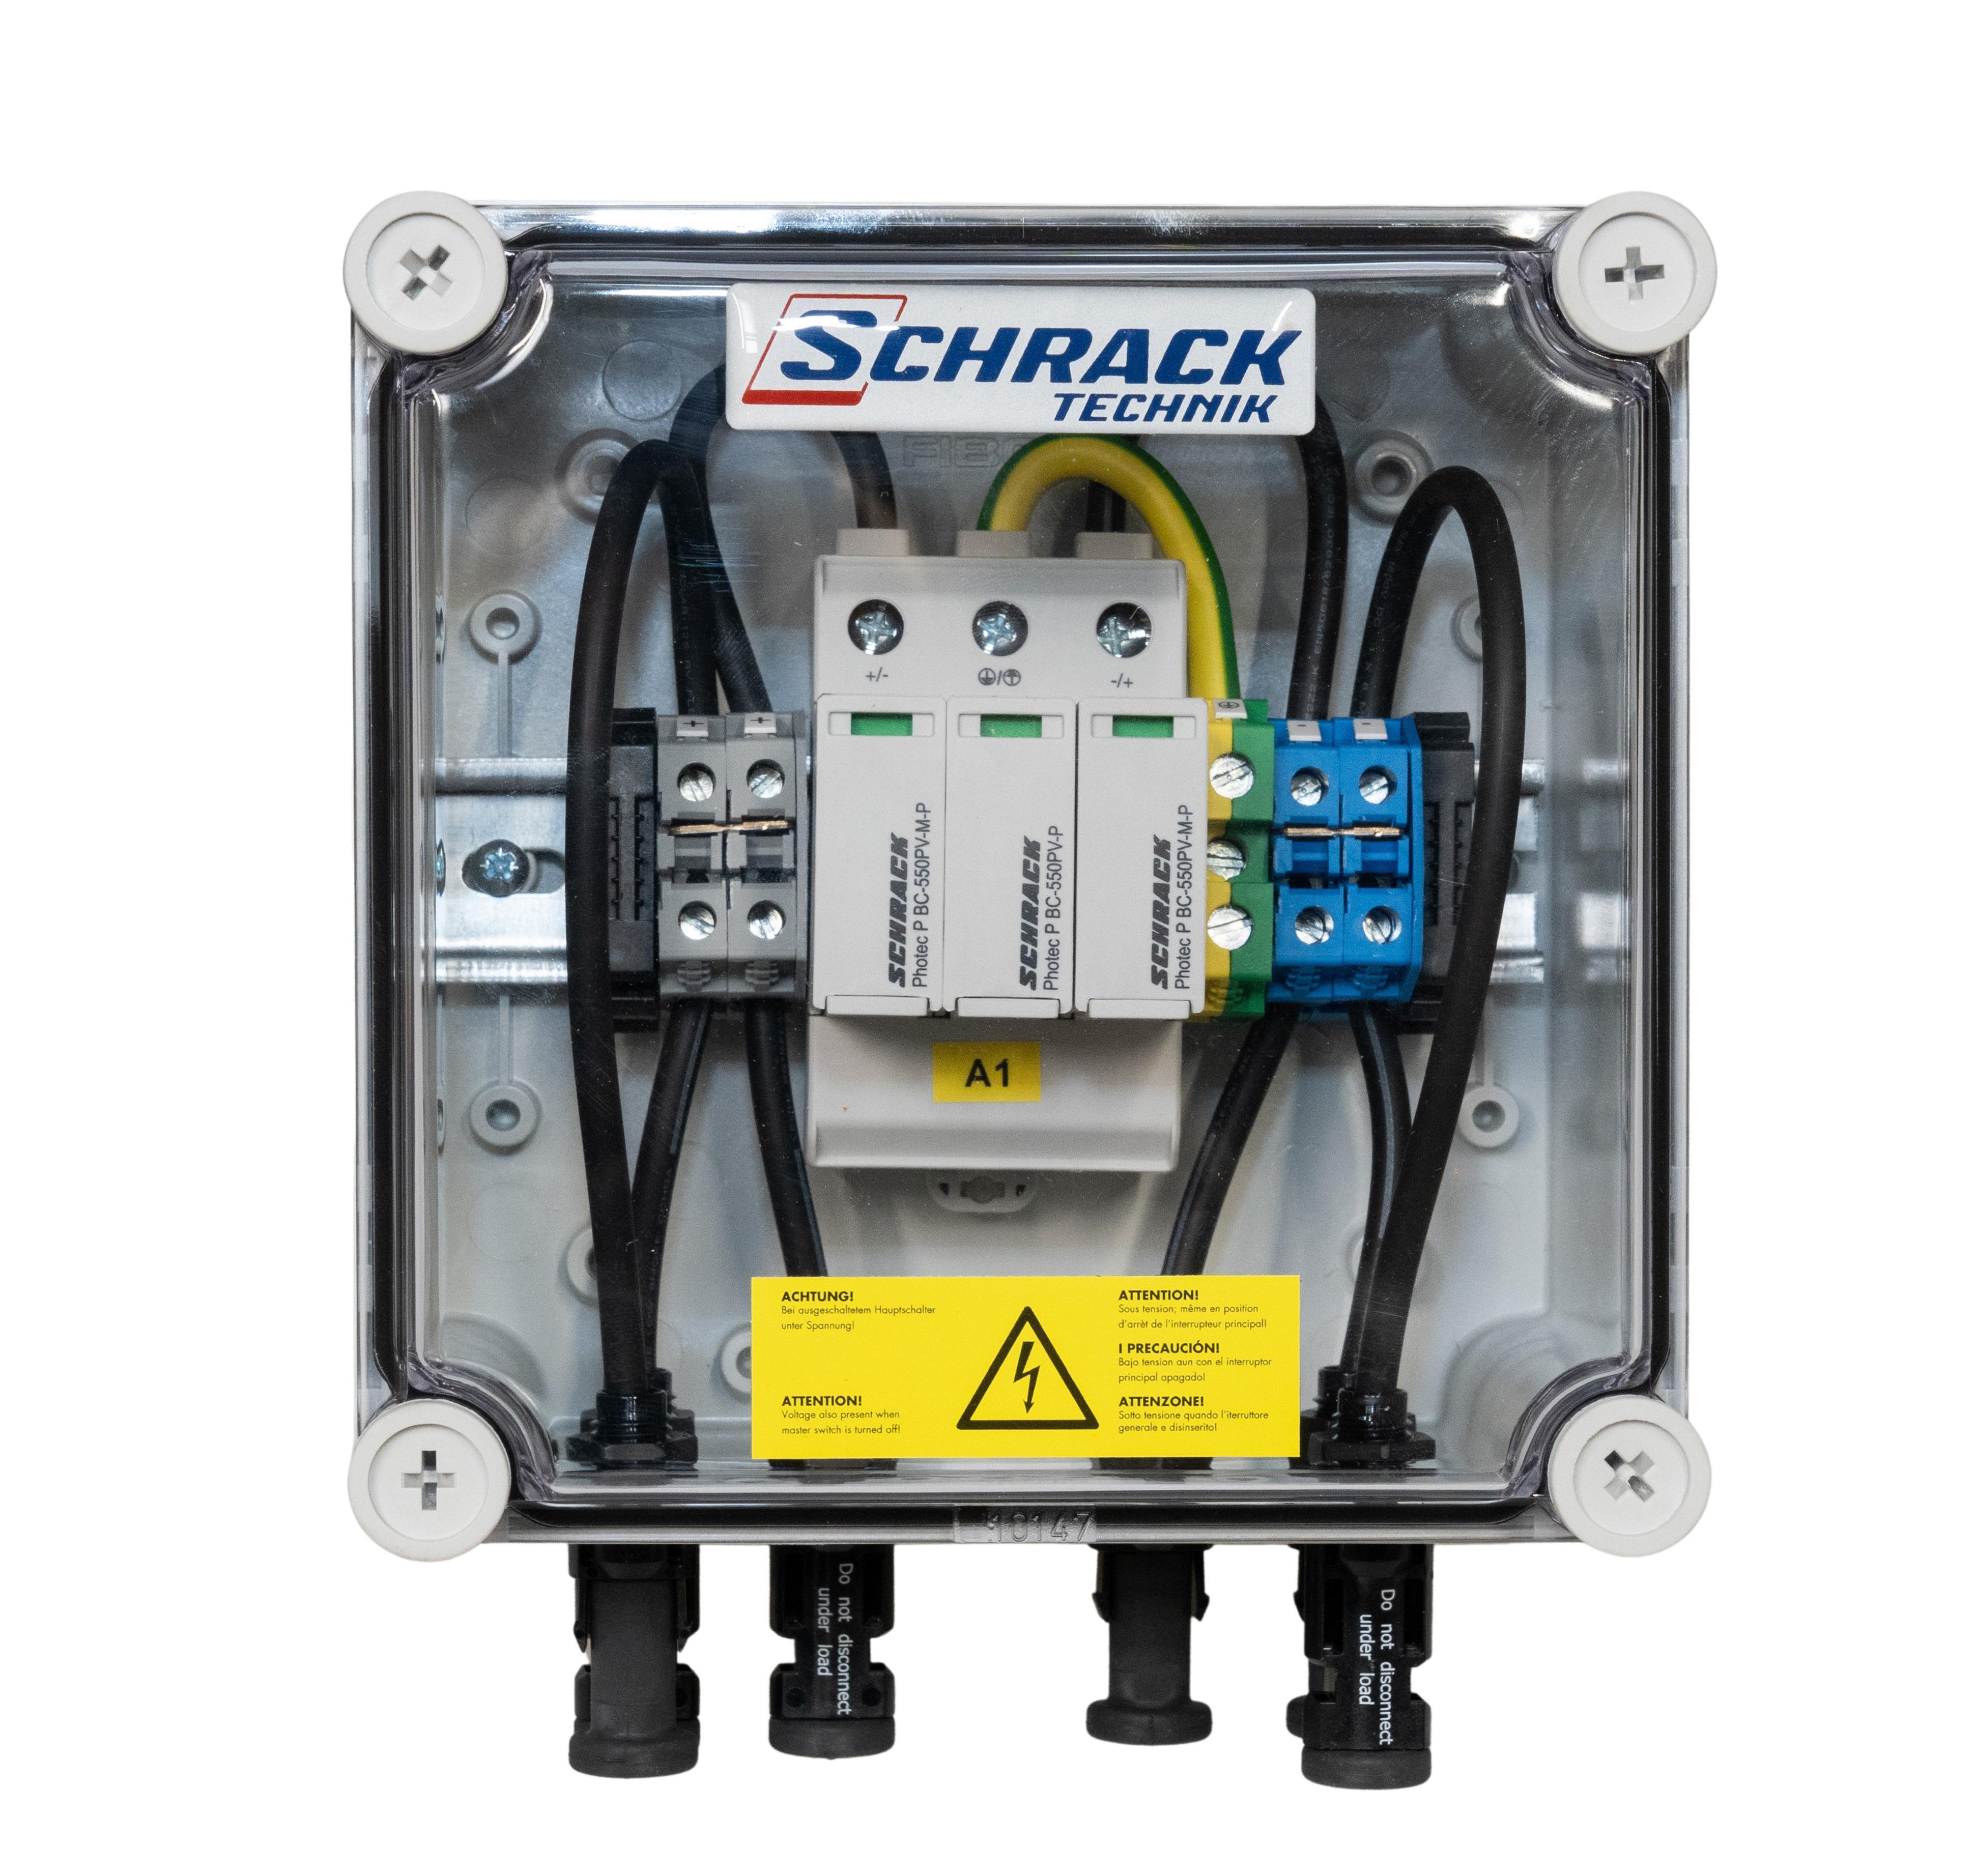 1 Stk PV-Blitzstromableiterbox für 1 Mpp Tracker, 1000Vdc PVP10001--